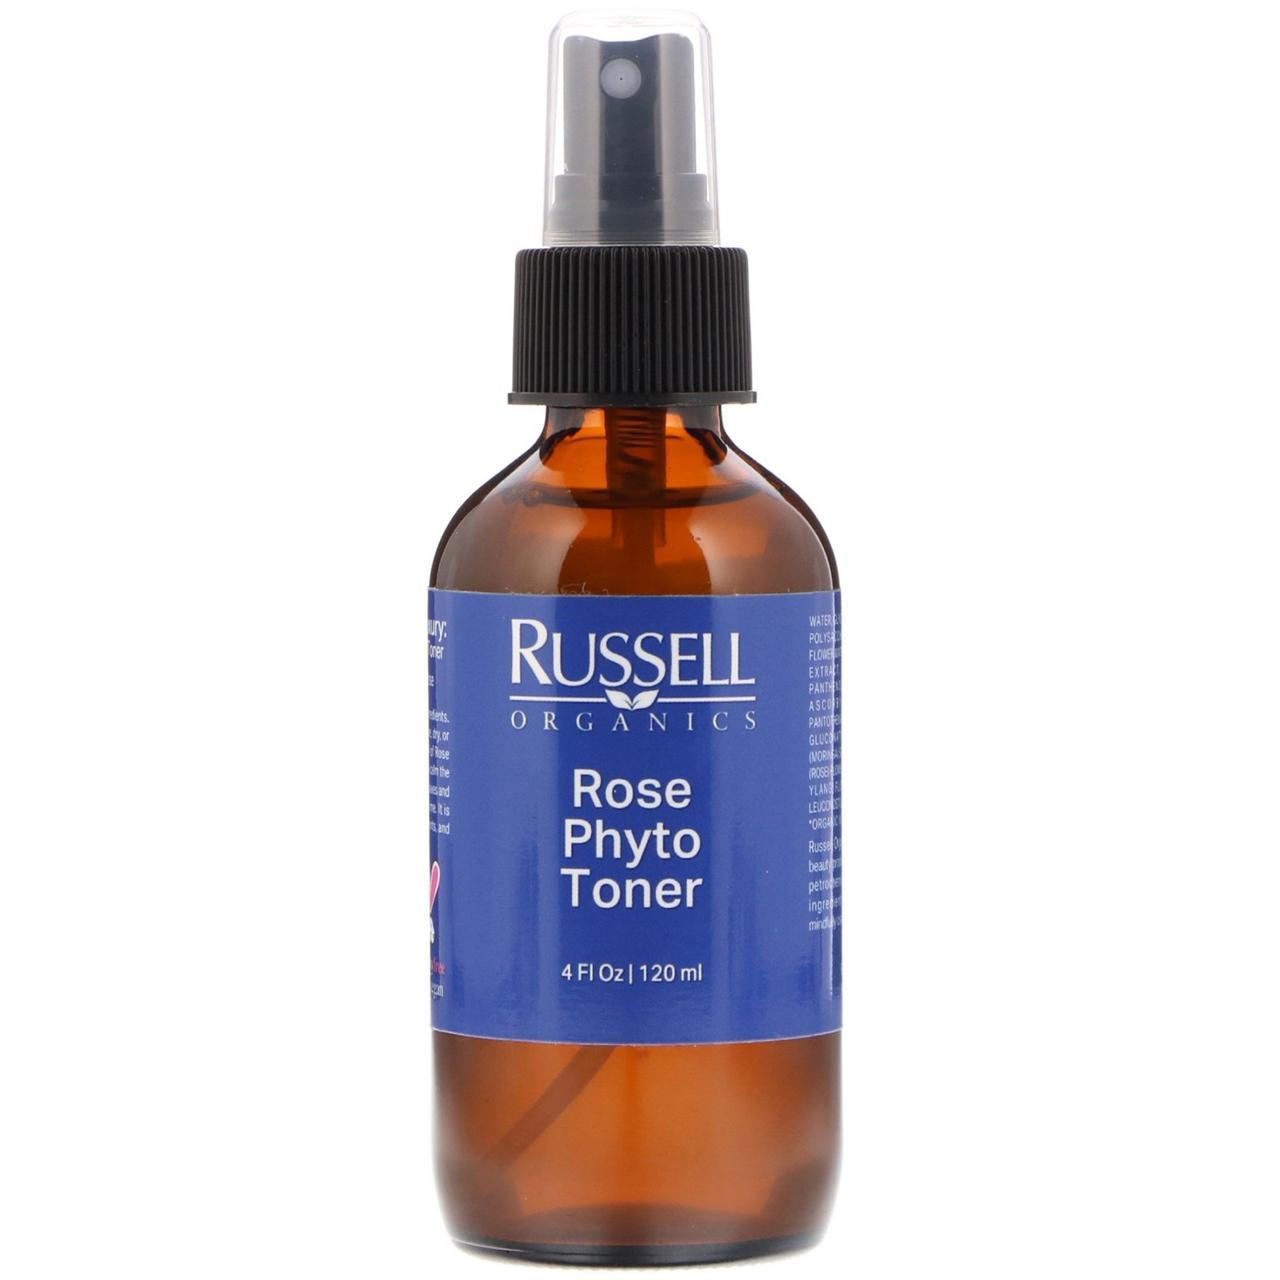 Russell Organics, Rose Phyto Toner, 4 fl oz (120 ml)